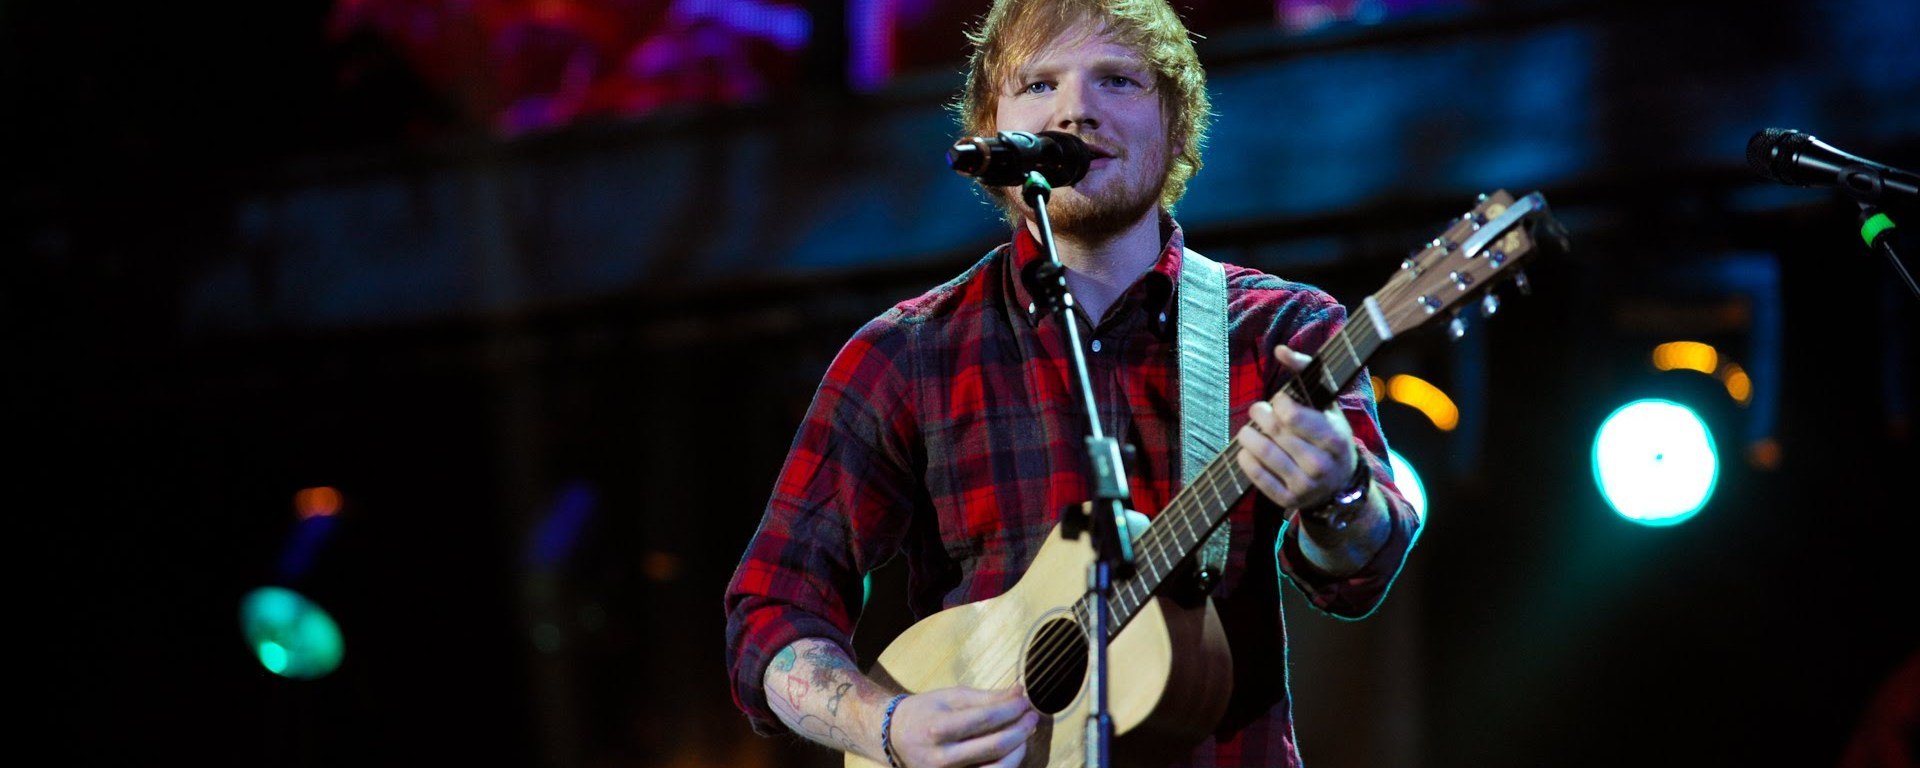 ed-sheeran-live